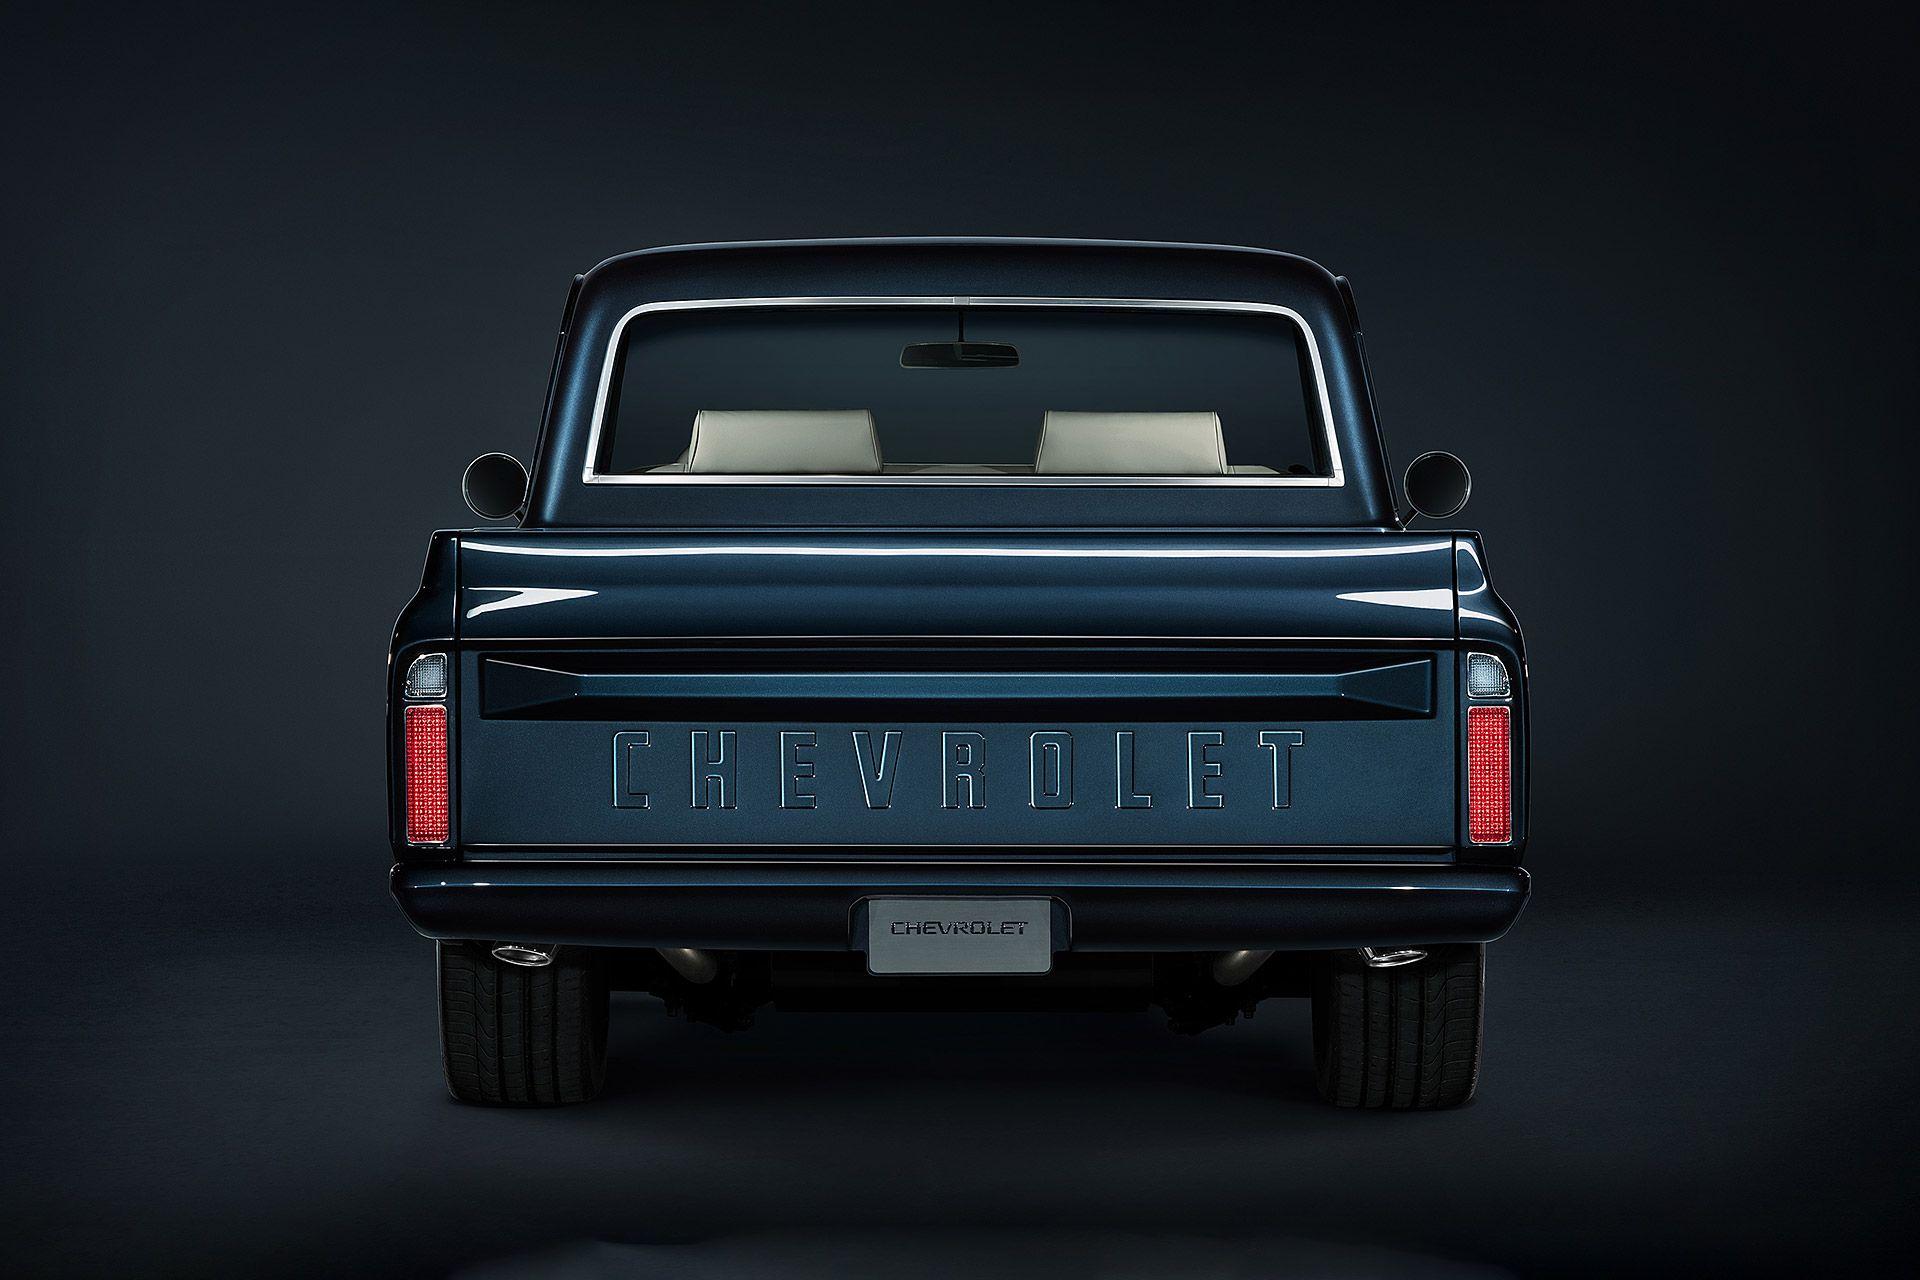 1967 Chevrolet C 10 Centennial Truck Chevy Trucks Chevy Chevrolet